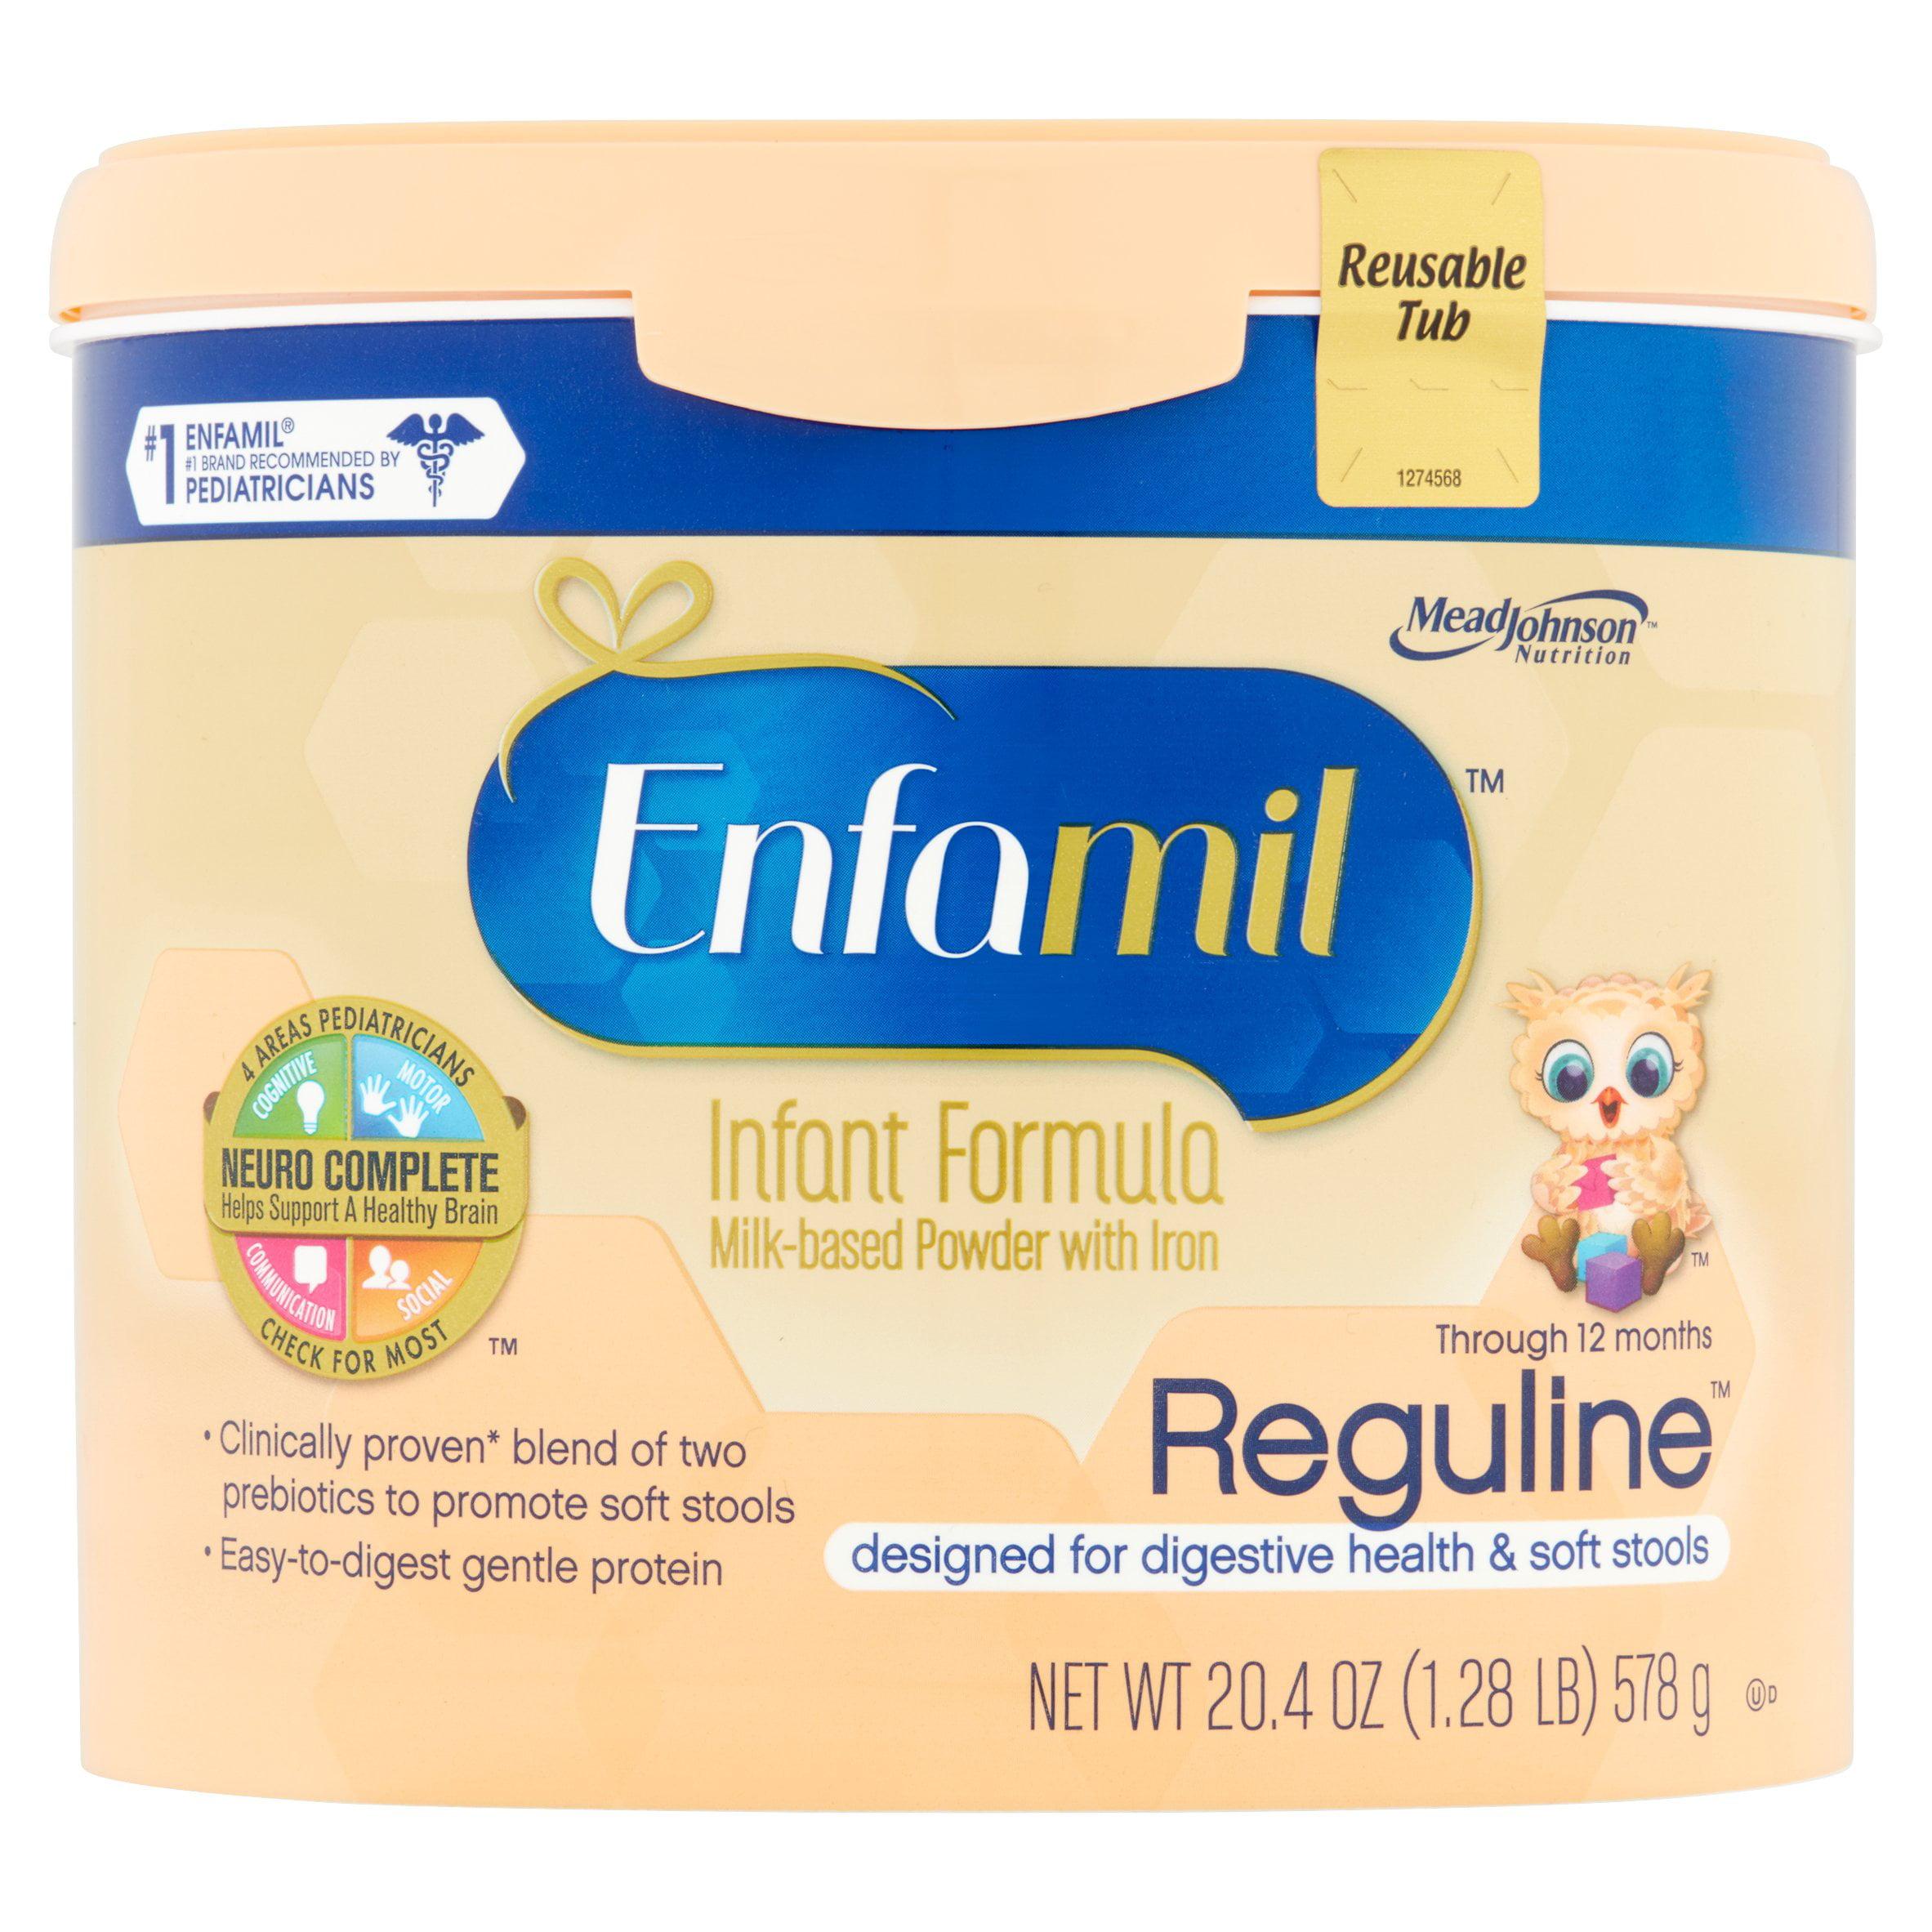 Enfamil Reguline Milk-Based Powder with Iron Infant Formula Through 12 Months, 20.4 oz, 4 count by Enfamil